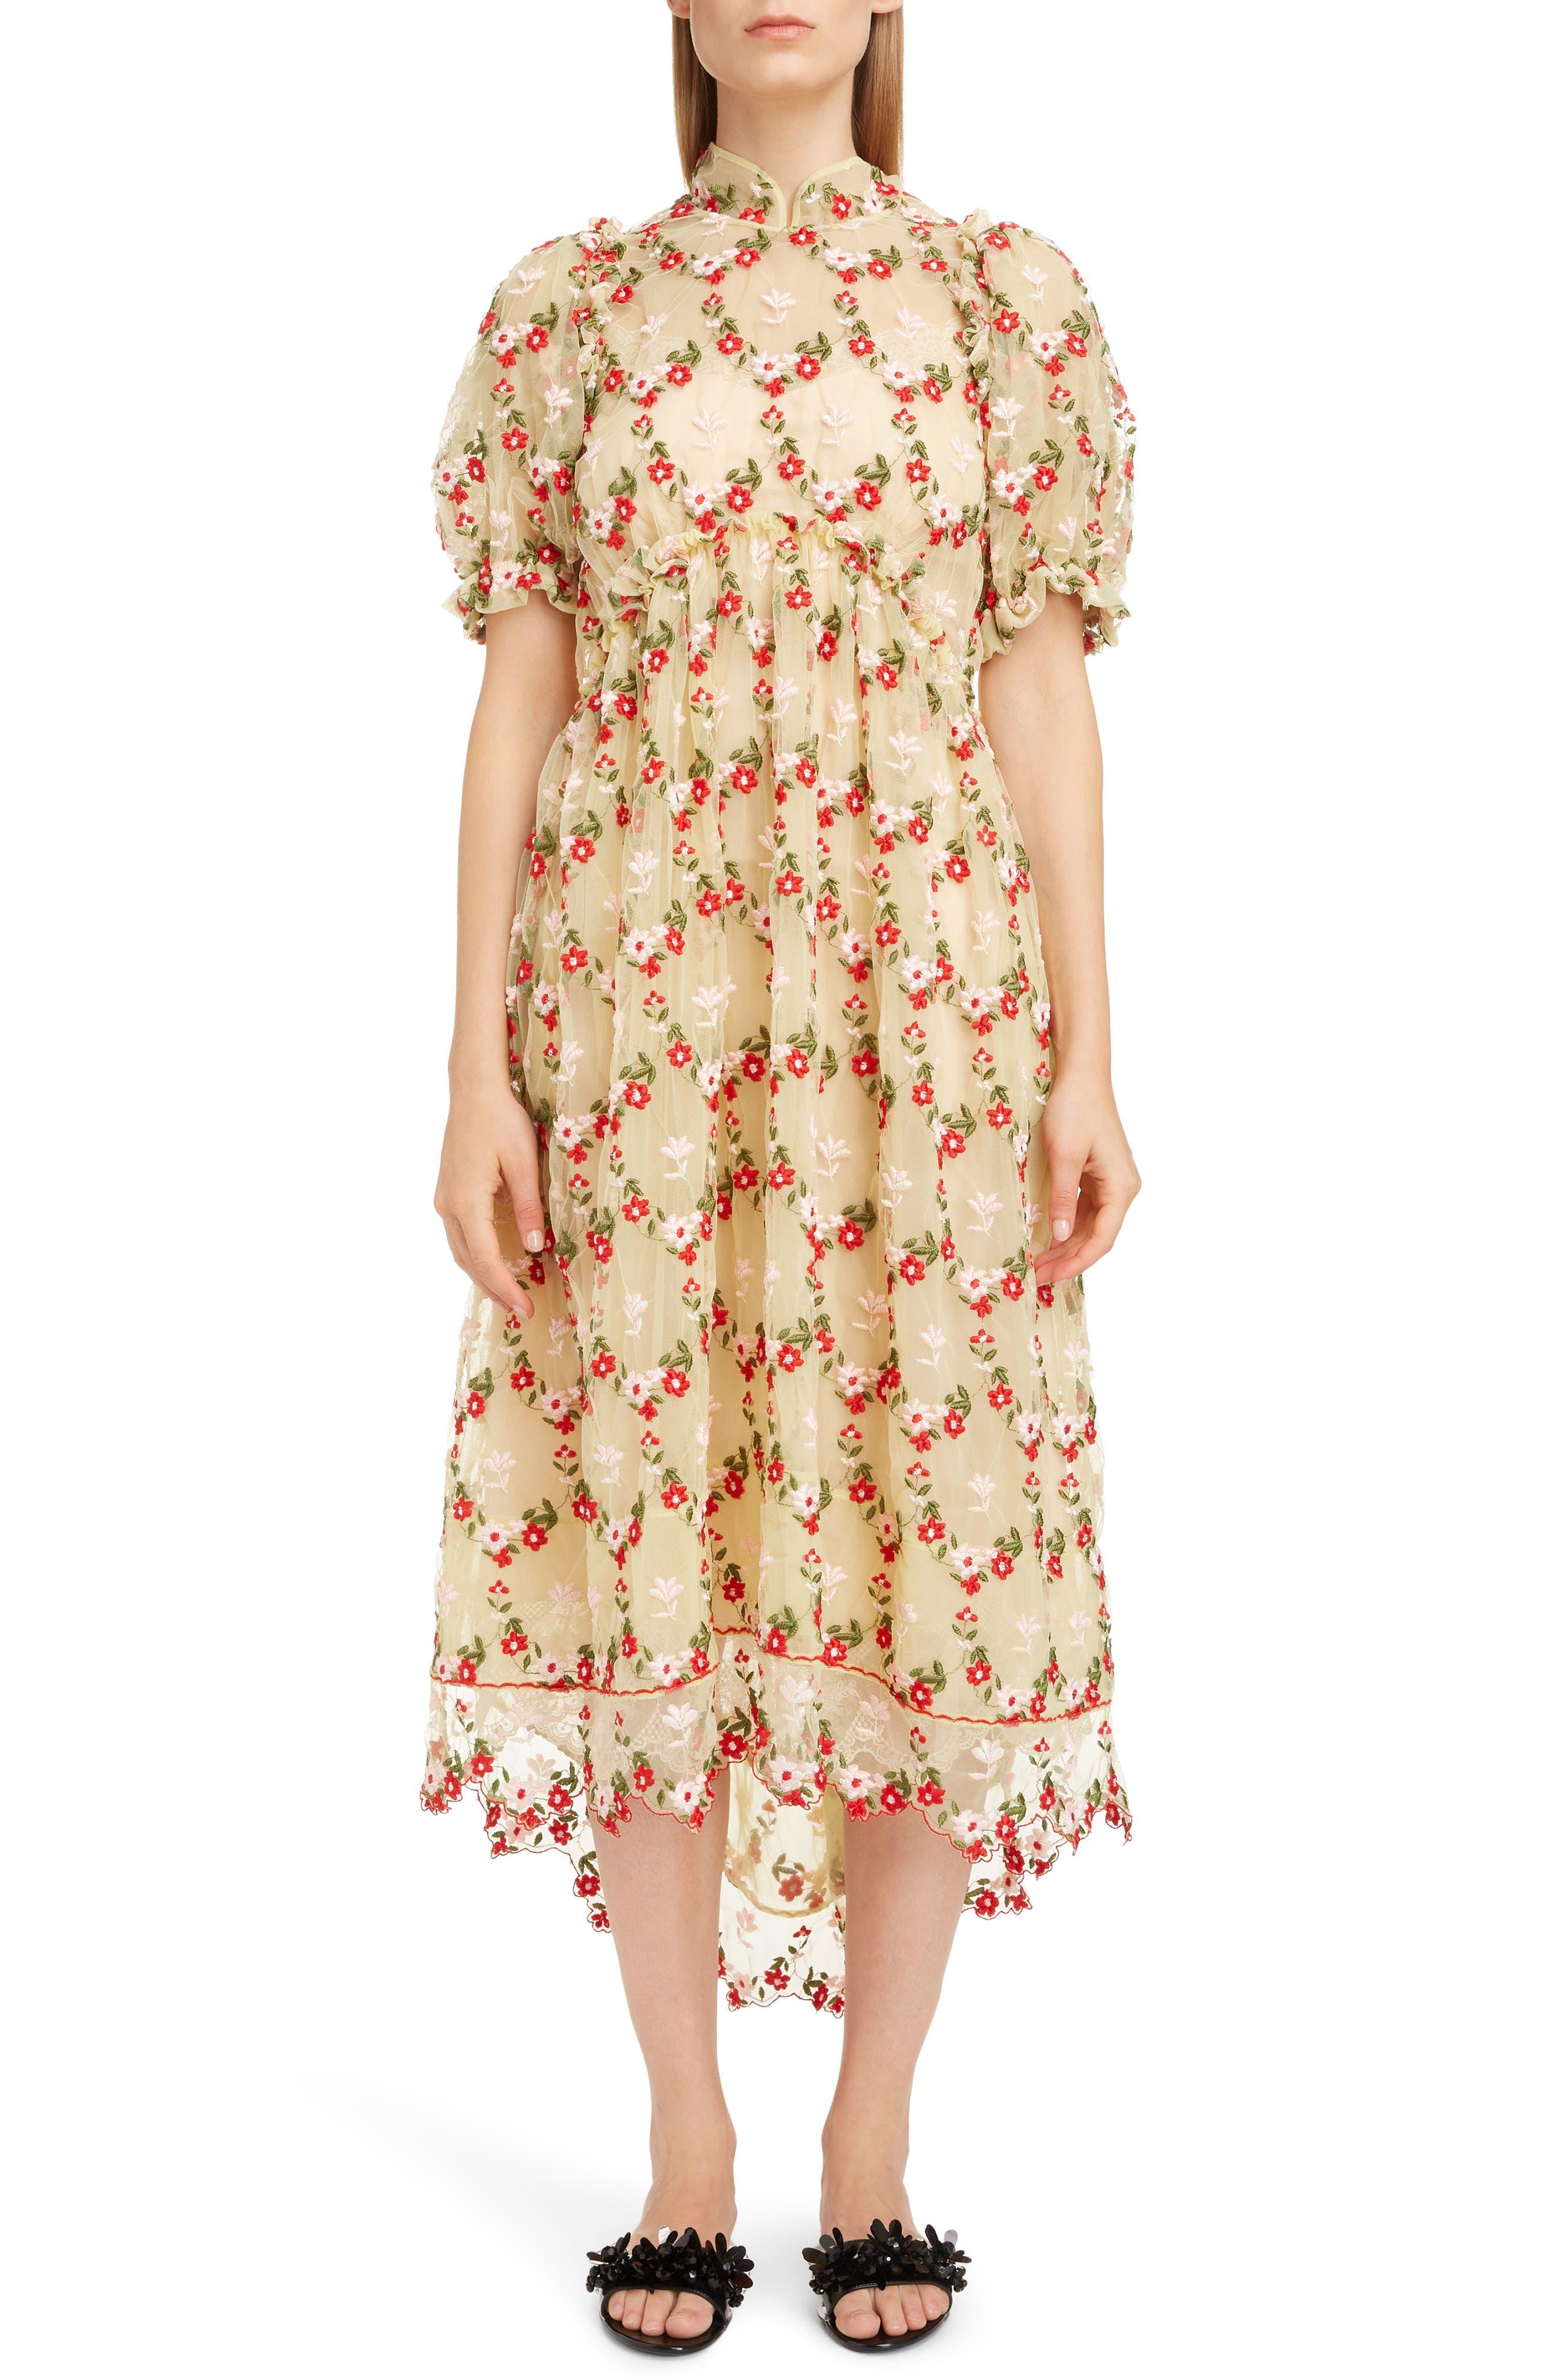 6a6a88e3d17ac Women's Simone Rocha Dresses | Nordstrom